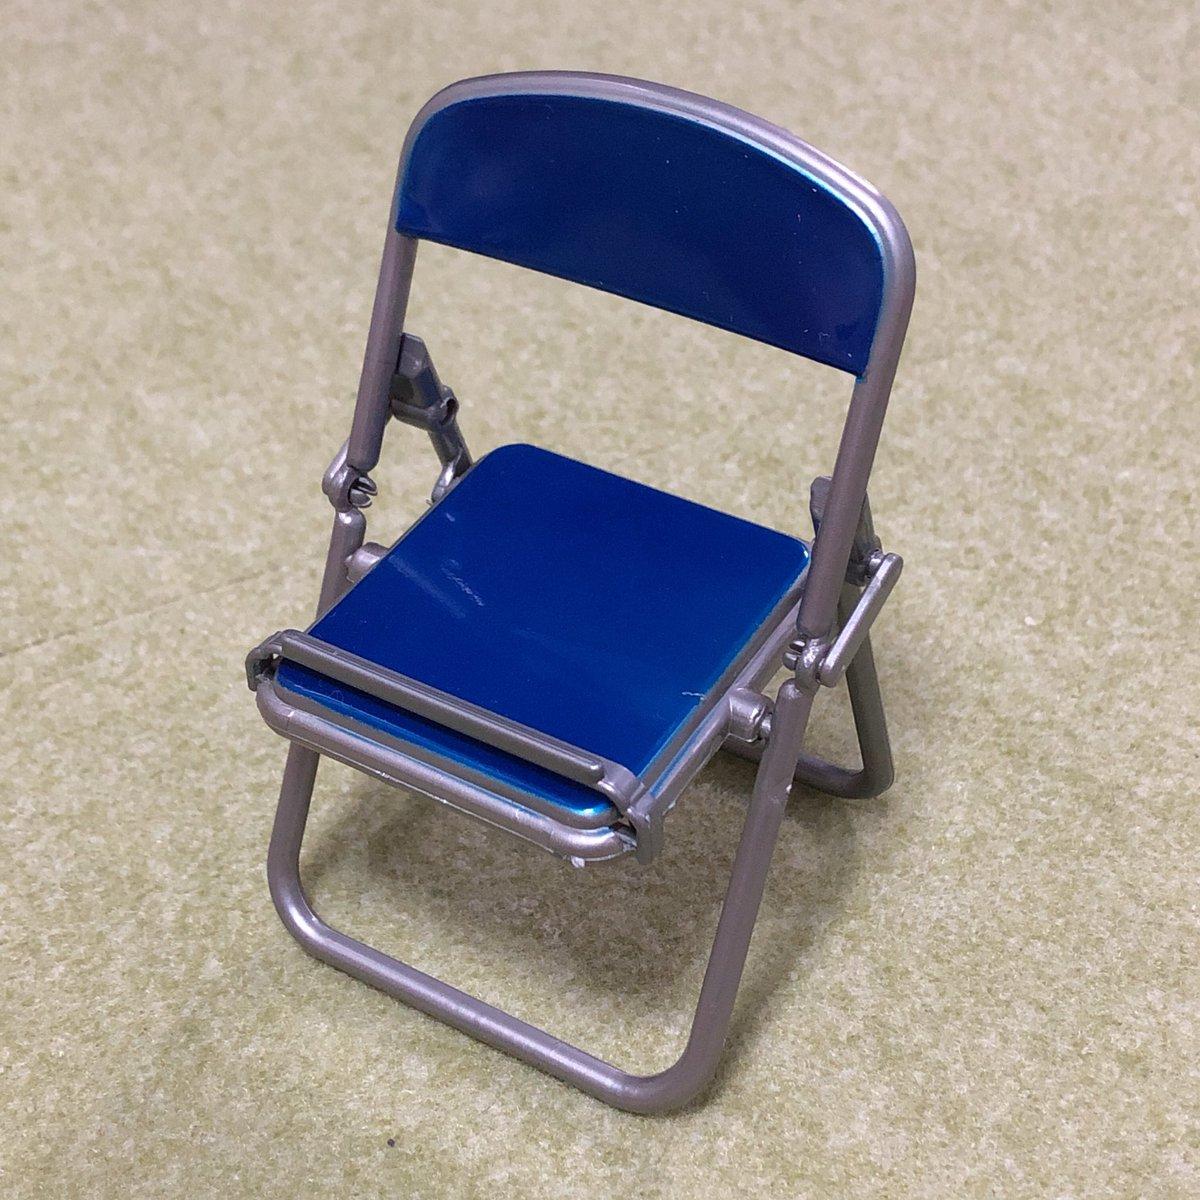 test ツイッターメディア - キャンドゥで見つけたスマホスタンド!!パイプ椅子!! #100均 #キャンドゥ #スマホスタンド #パイプ椅子 https://t.co/phtFCTyDMl